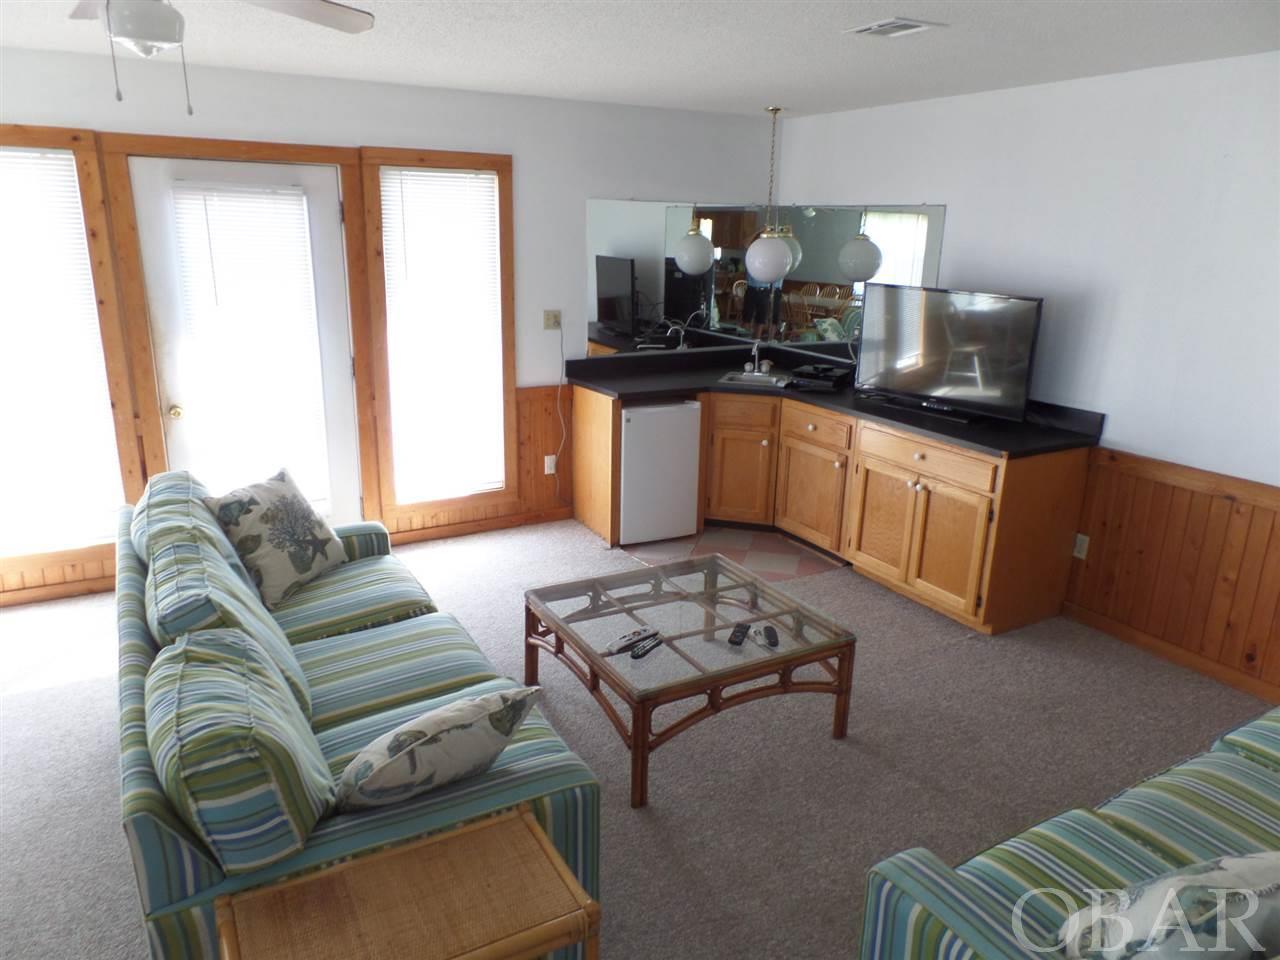 8701 Old Oregon Inlet Road,Nags Head,NC 27959,4 Bedrooms Bedrooms,3 BathroomsBathrooms,Residential,Old Oregon Inlet Road,97936